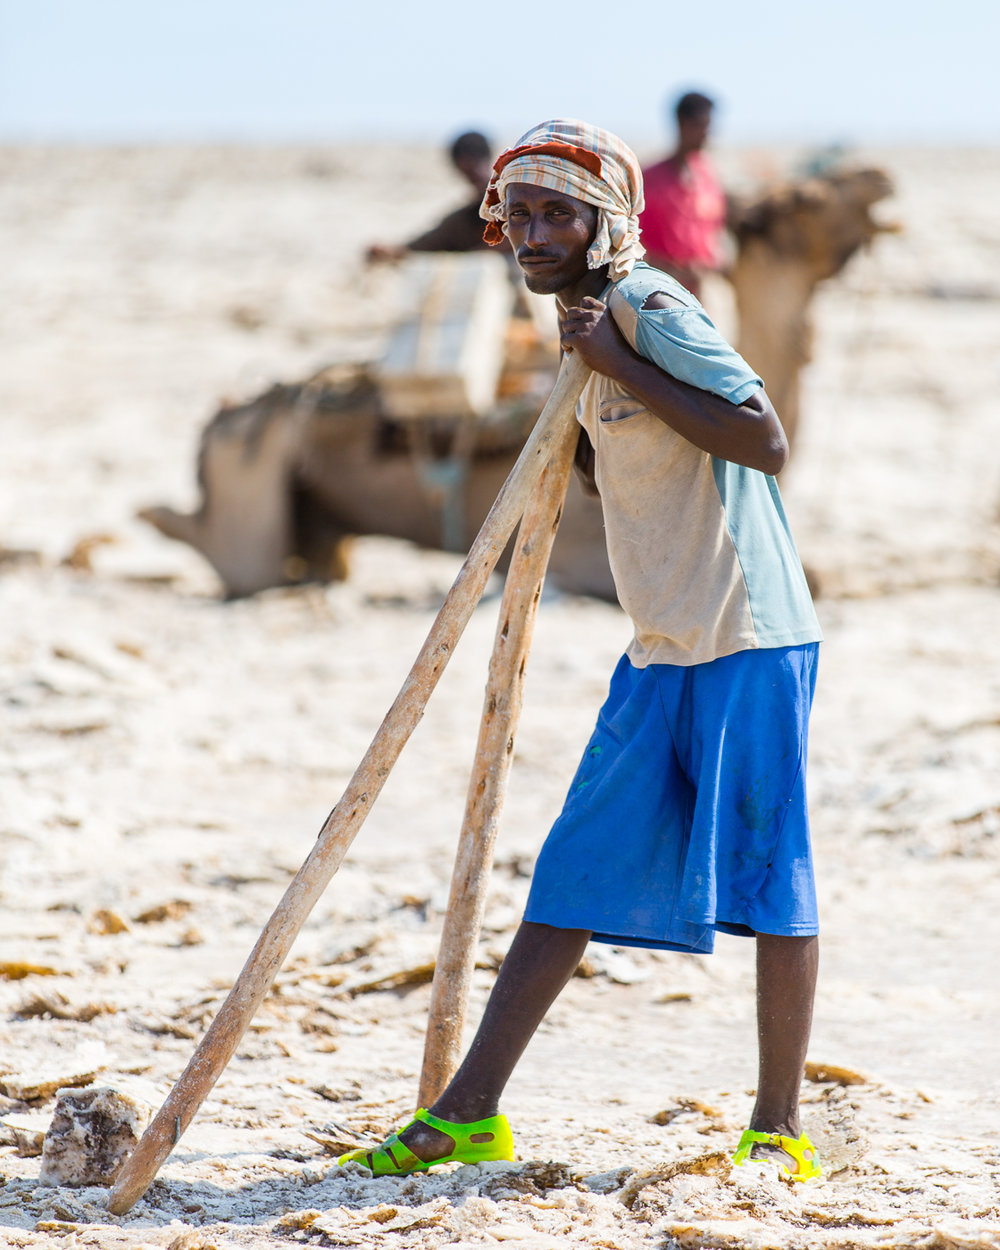 Ethiopia_Danakil-25.jpg